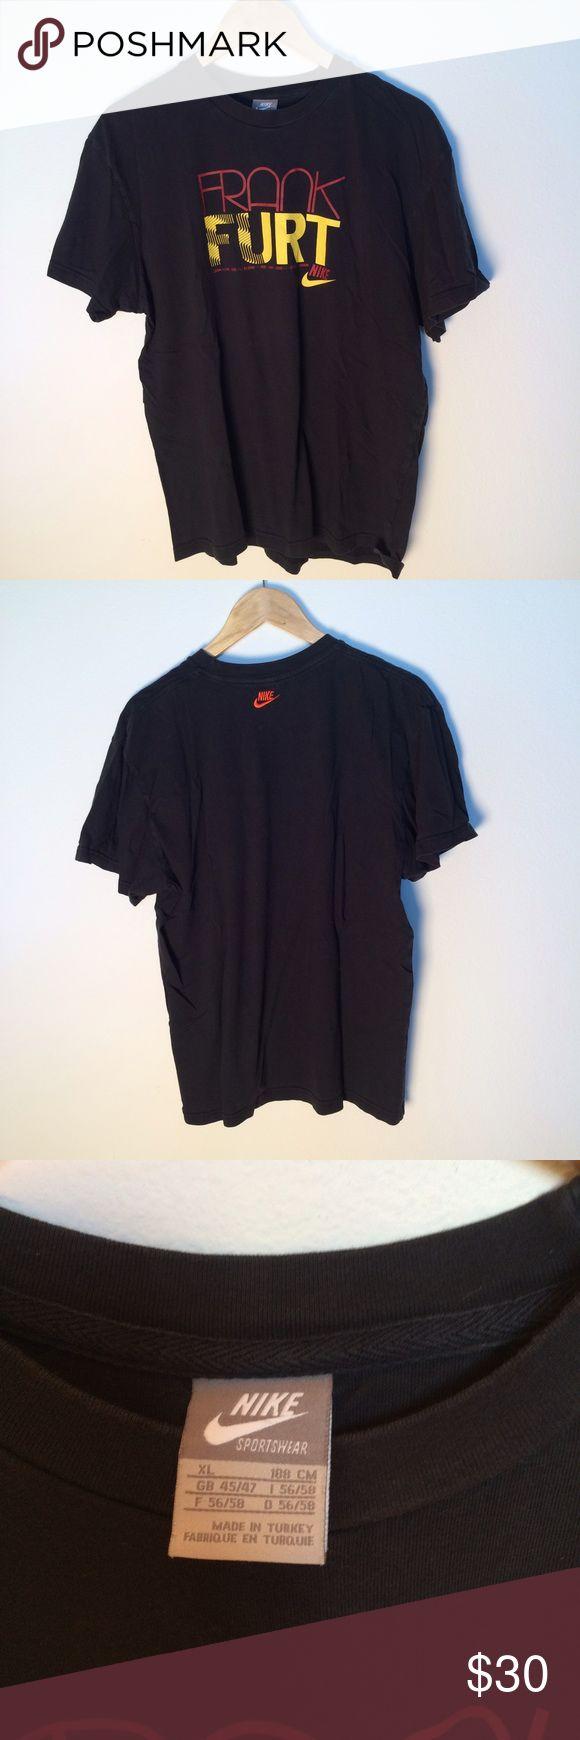 Vintage Nike Frankfurt Germany 🇩🇪 T-Shirt XL Blk Black Nike vintage shirt. Represents Frankfurt Germany! Size XL. Nike Shirts Tees - Short Sleeve